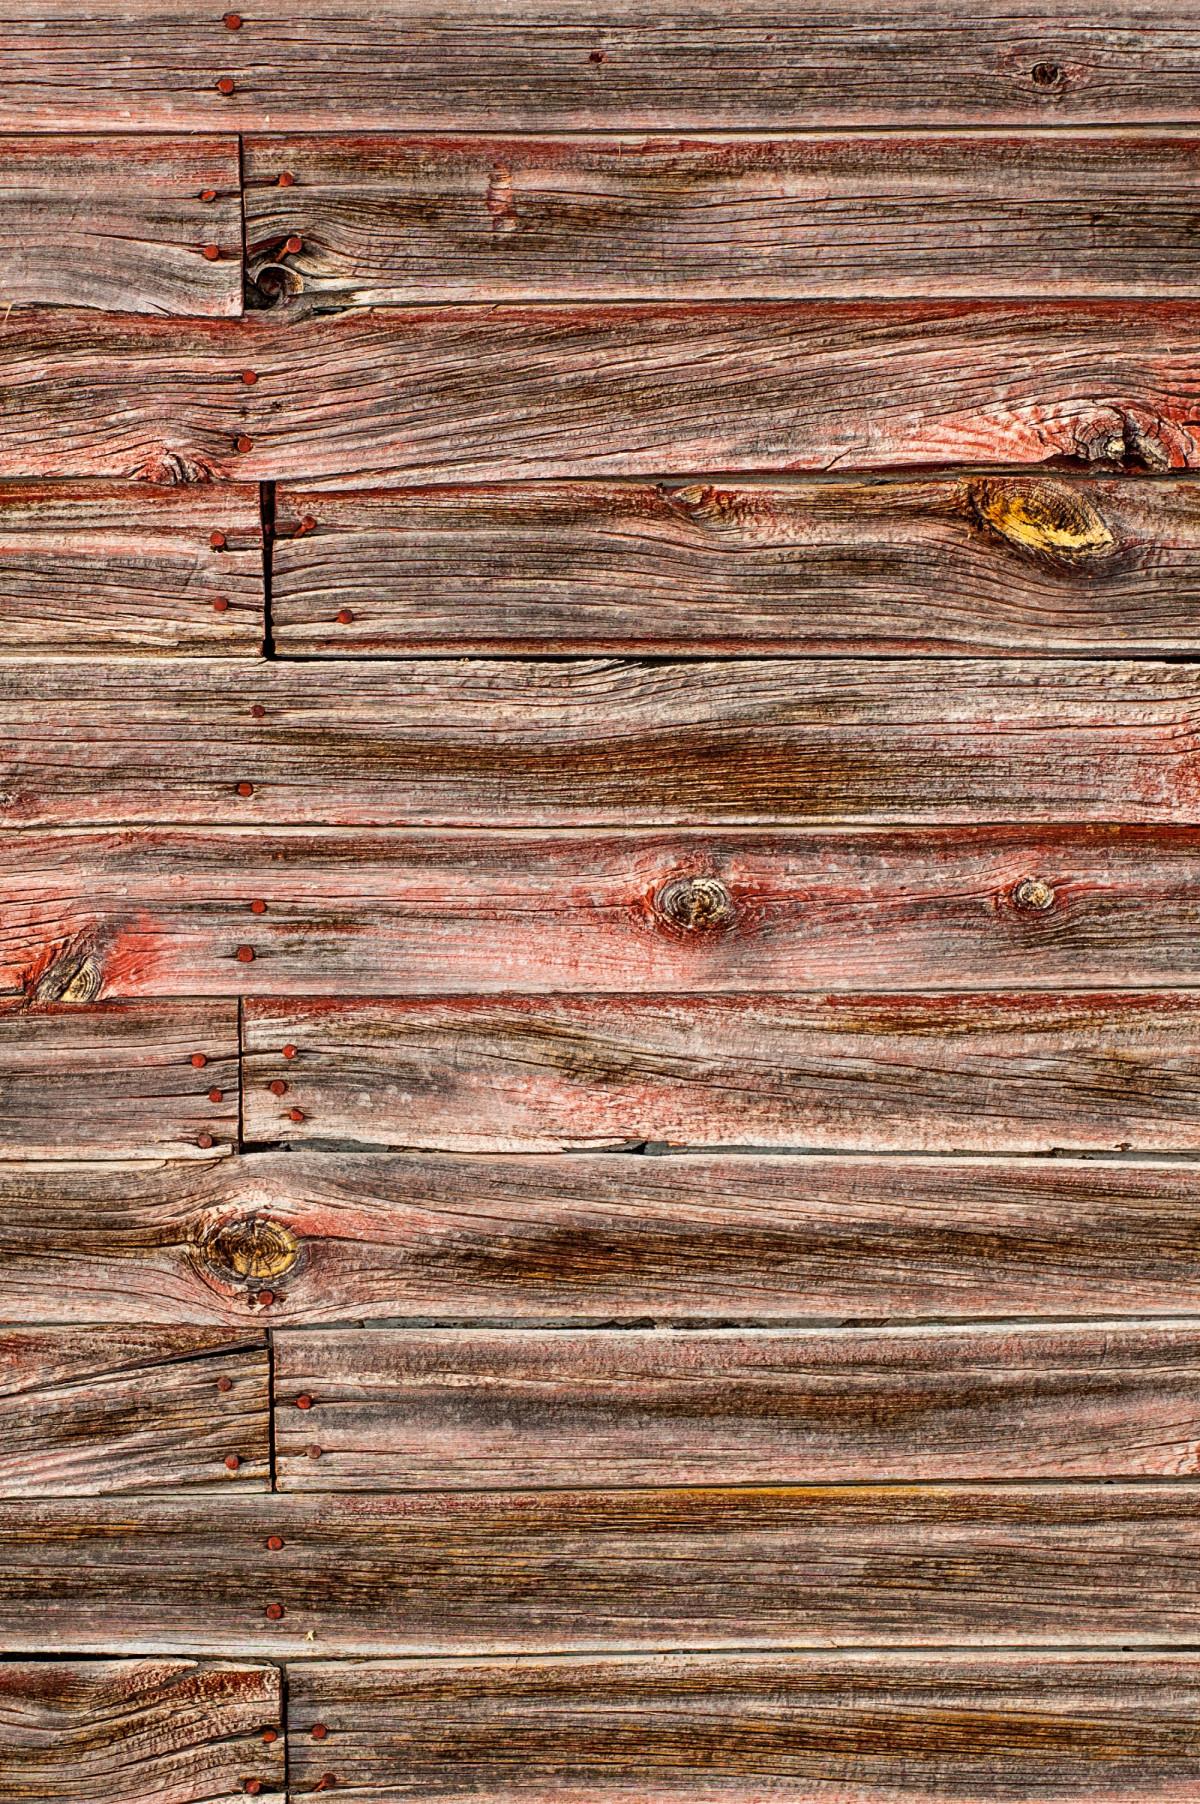 Free Images Vintage Grain House Plank Floor